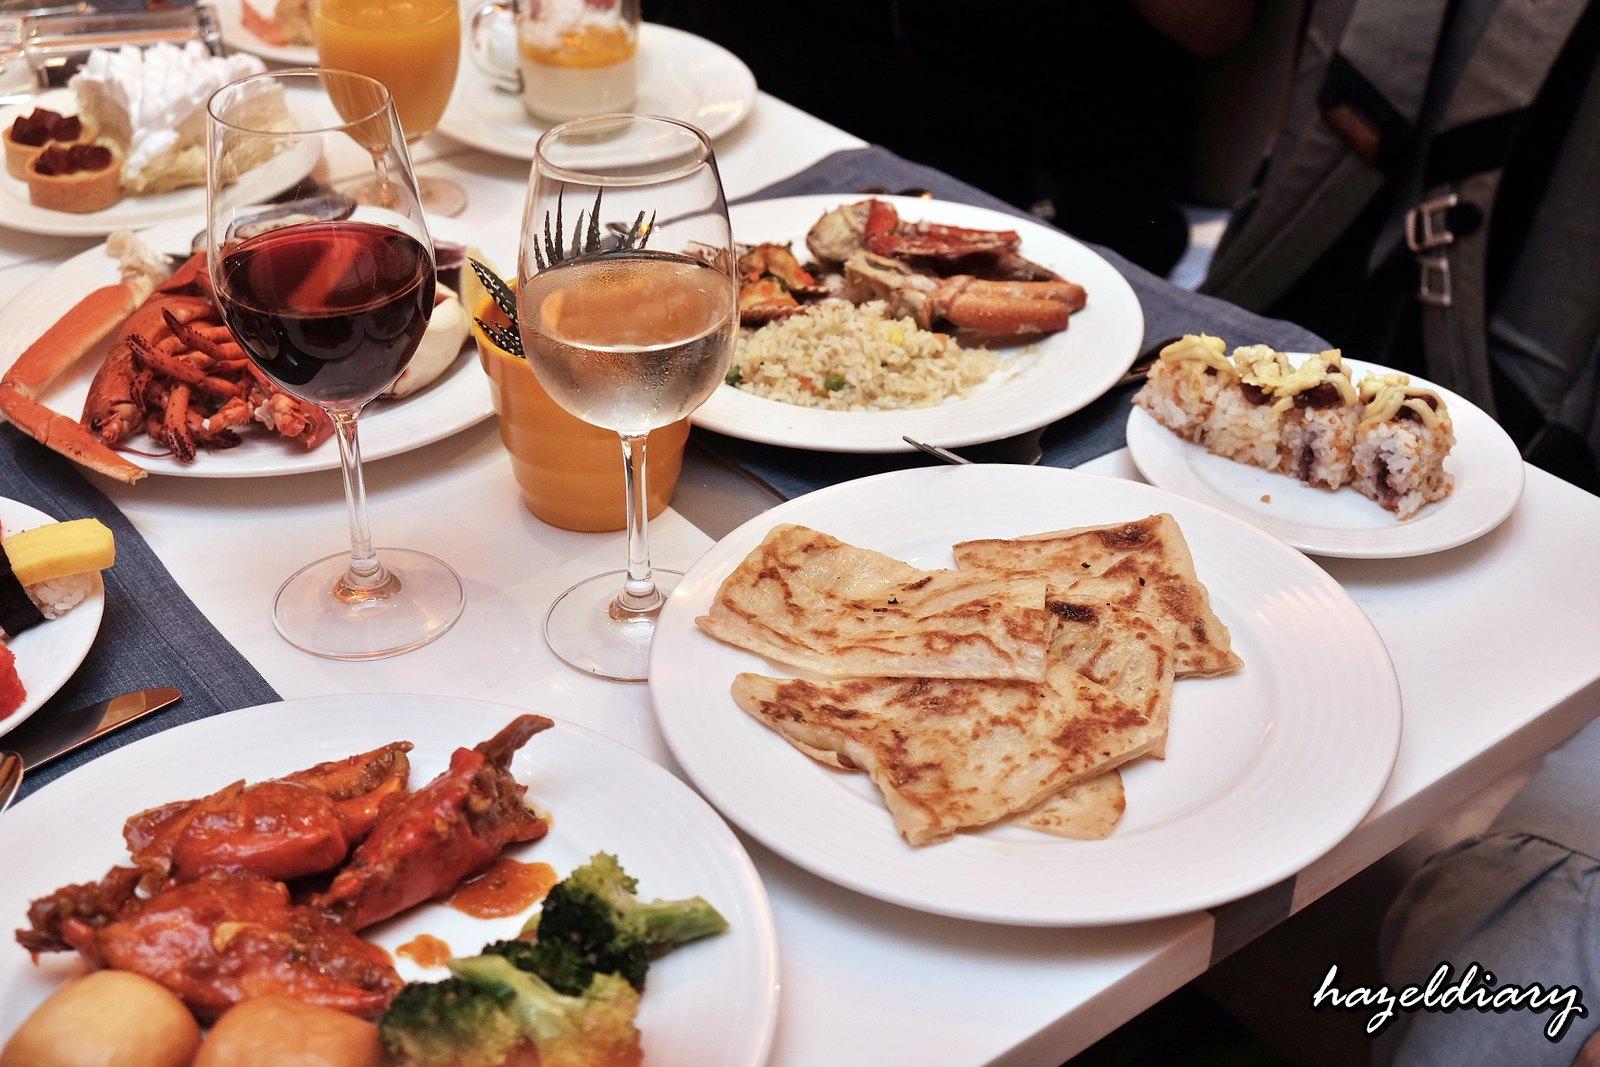 The Line Shangri-La Hotel-Durian buffet-Hazeldiary